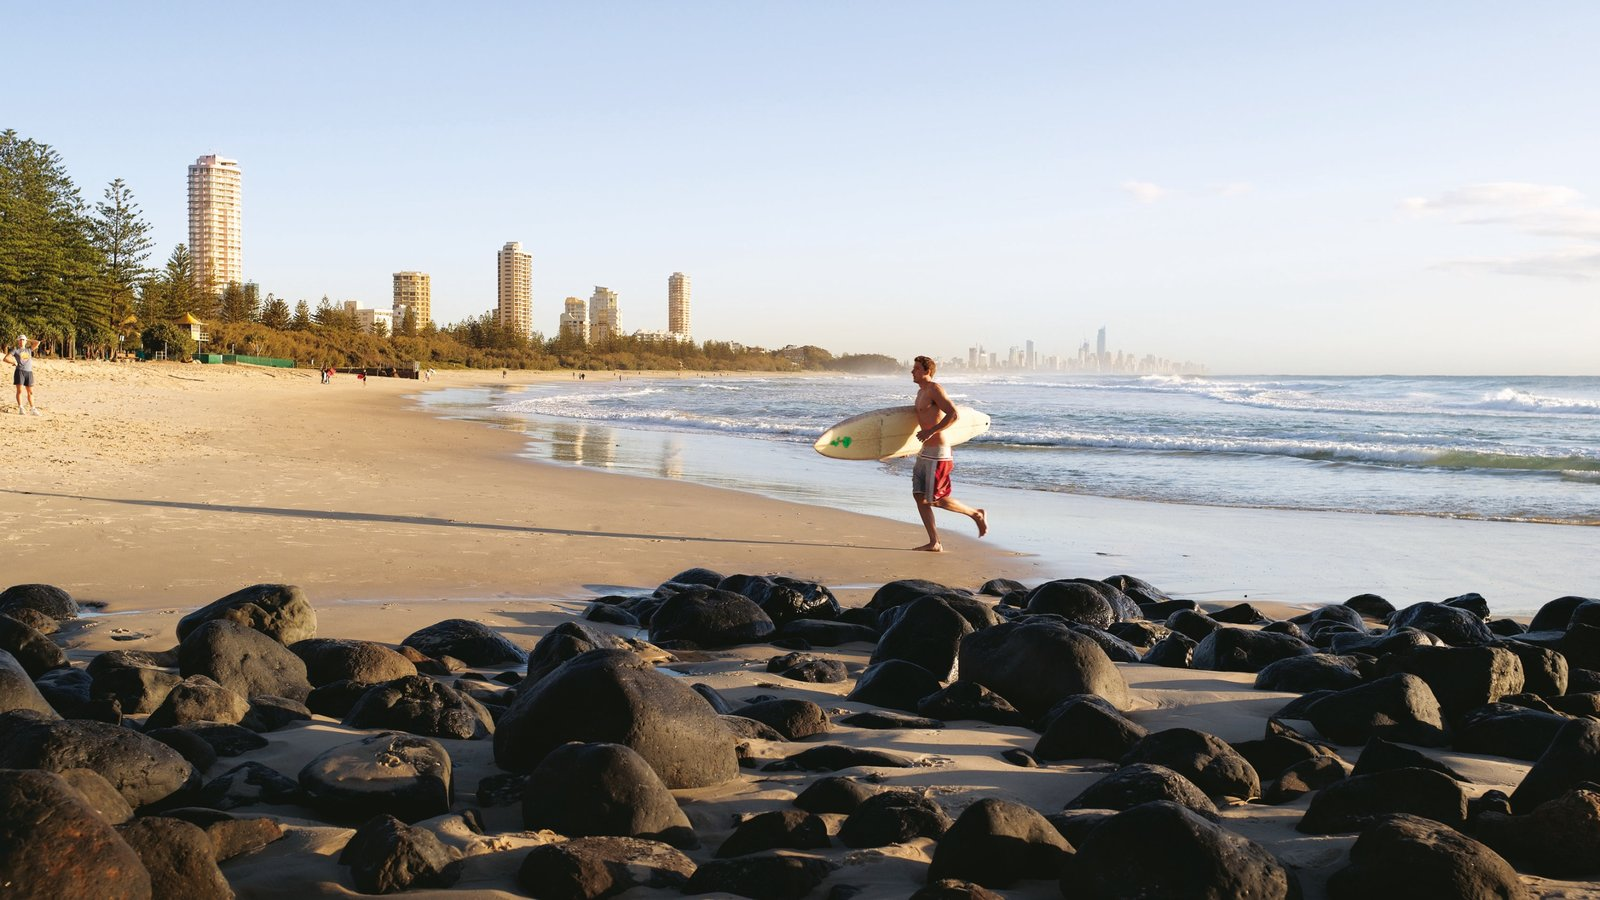 Coolangatta featuring tropical scenes, a skyscraper and surfing